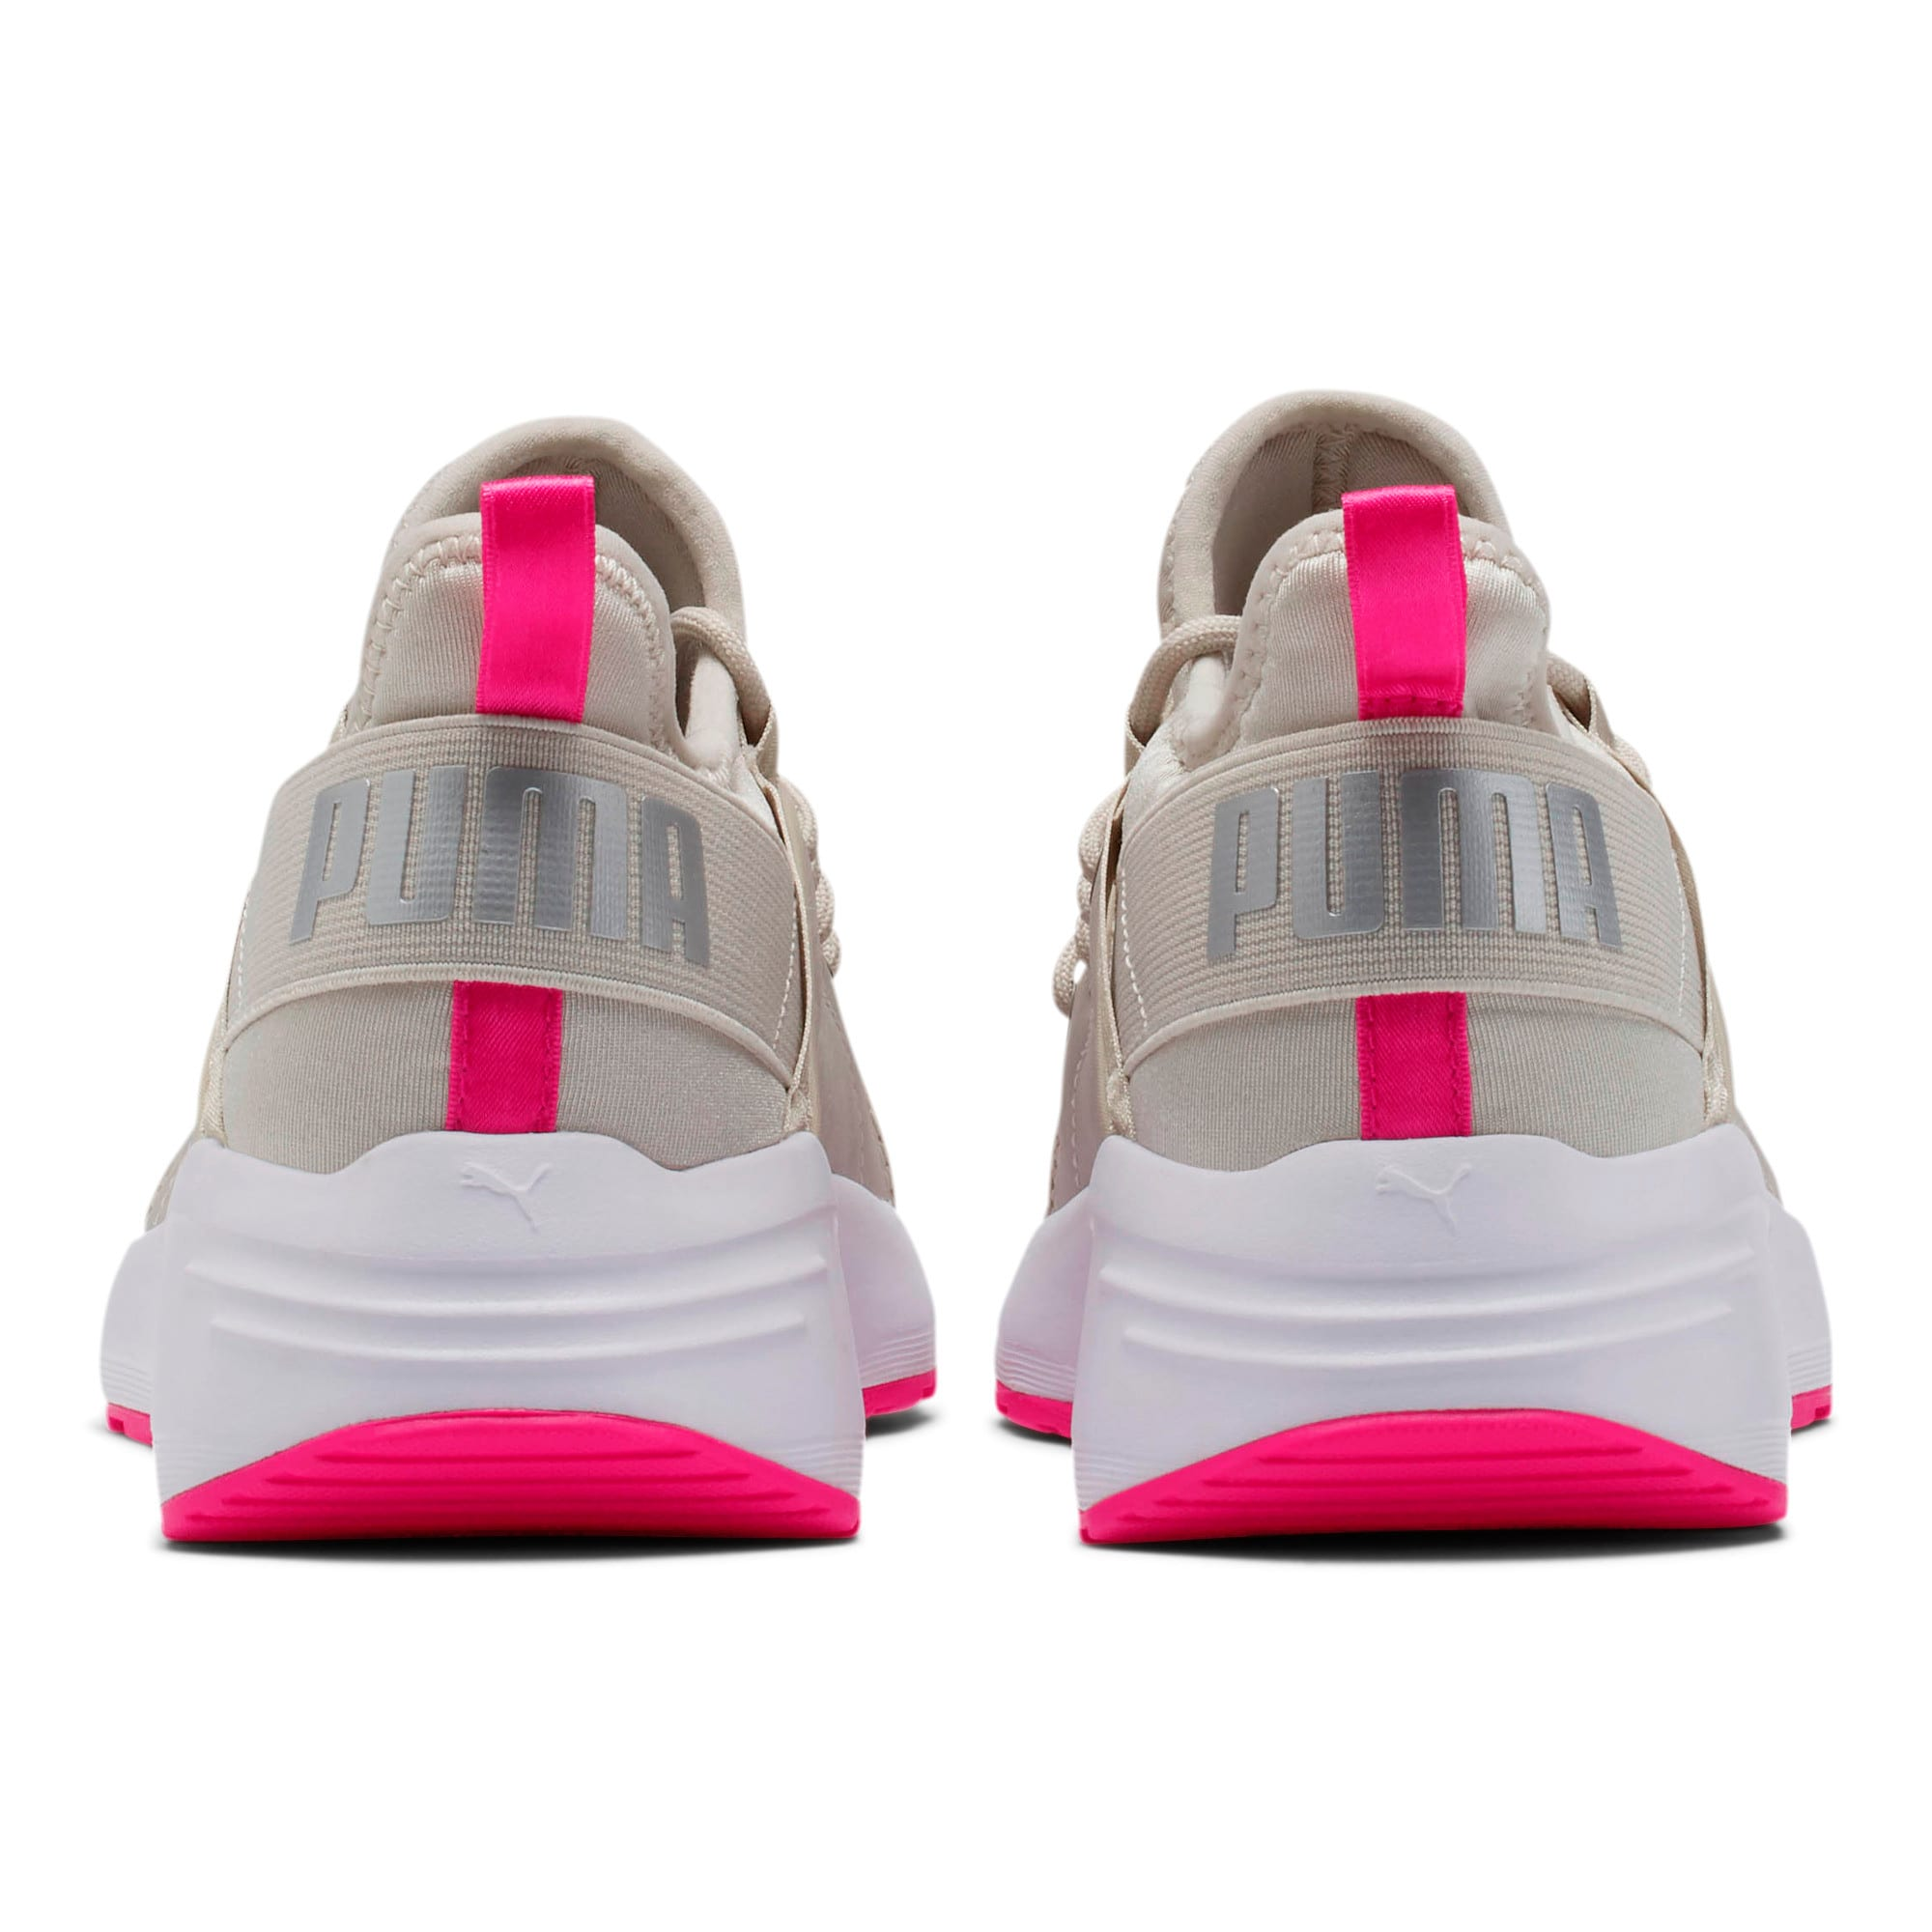 Thumbnail 4 of Sirena Summer Women's Sneakers, Silver Gray-Puma White, medium